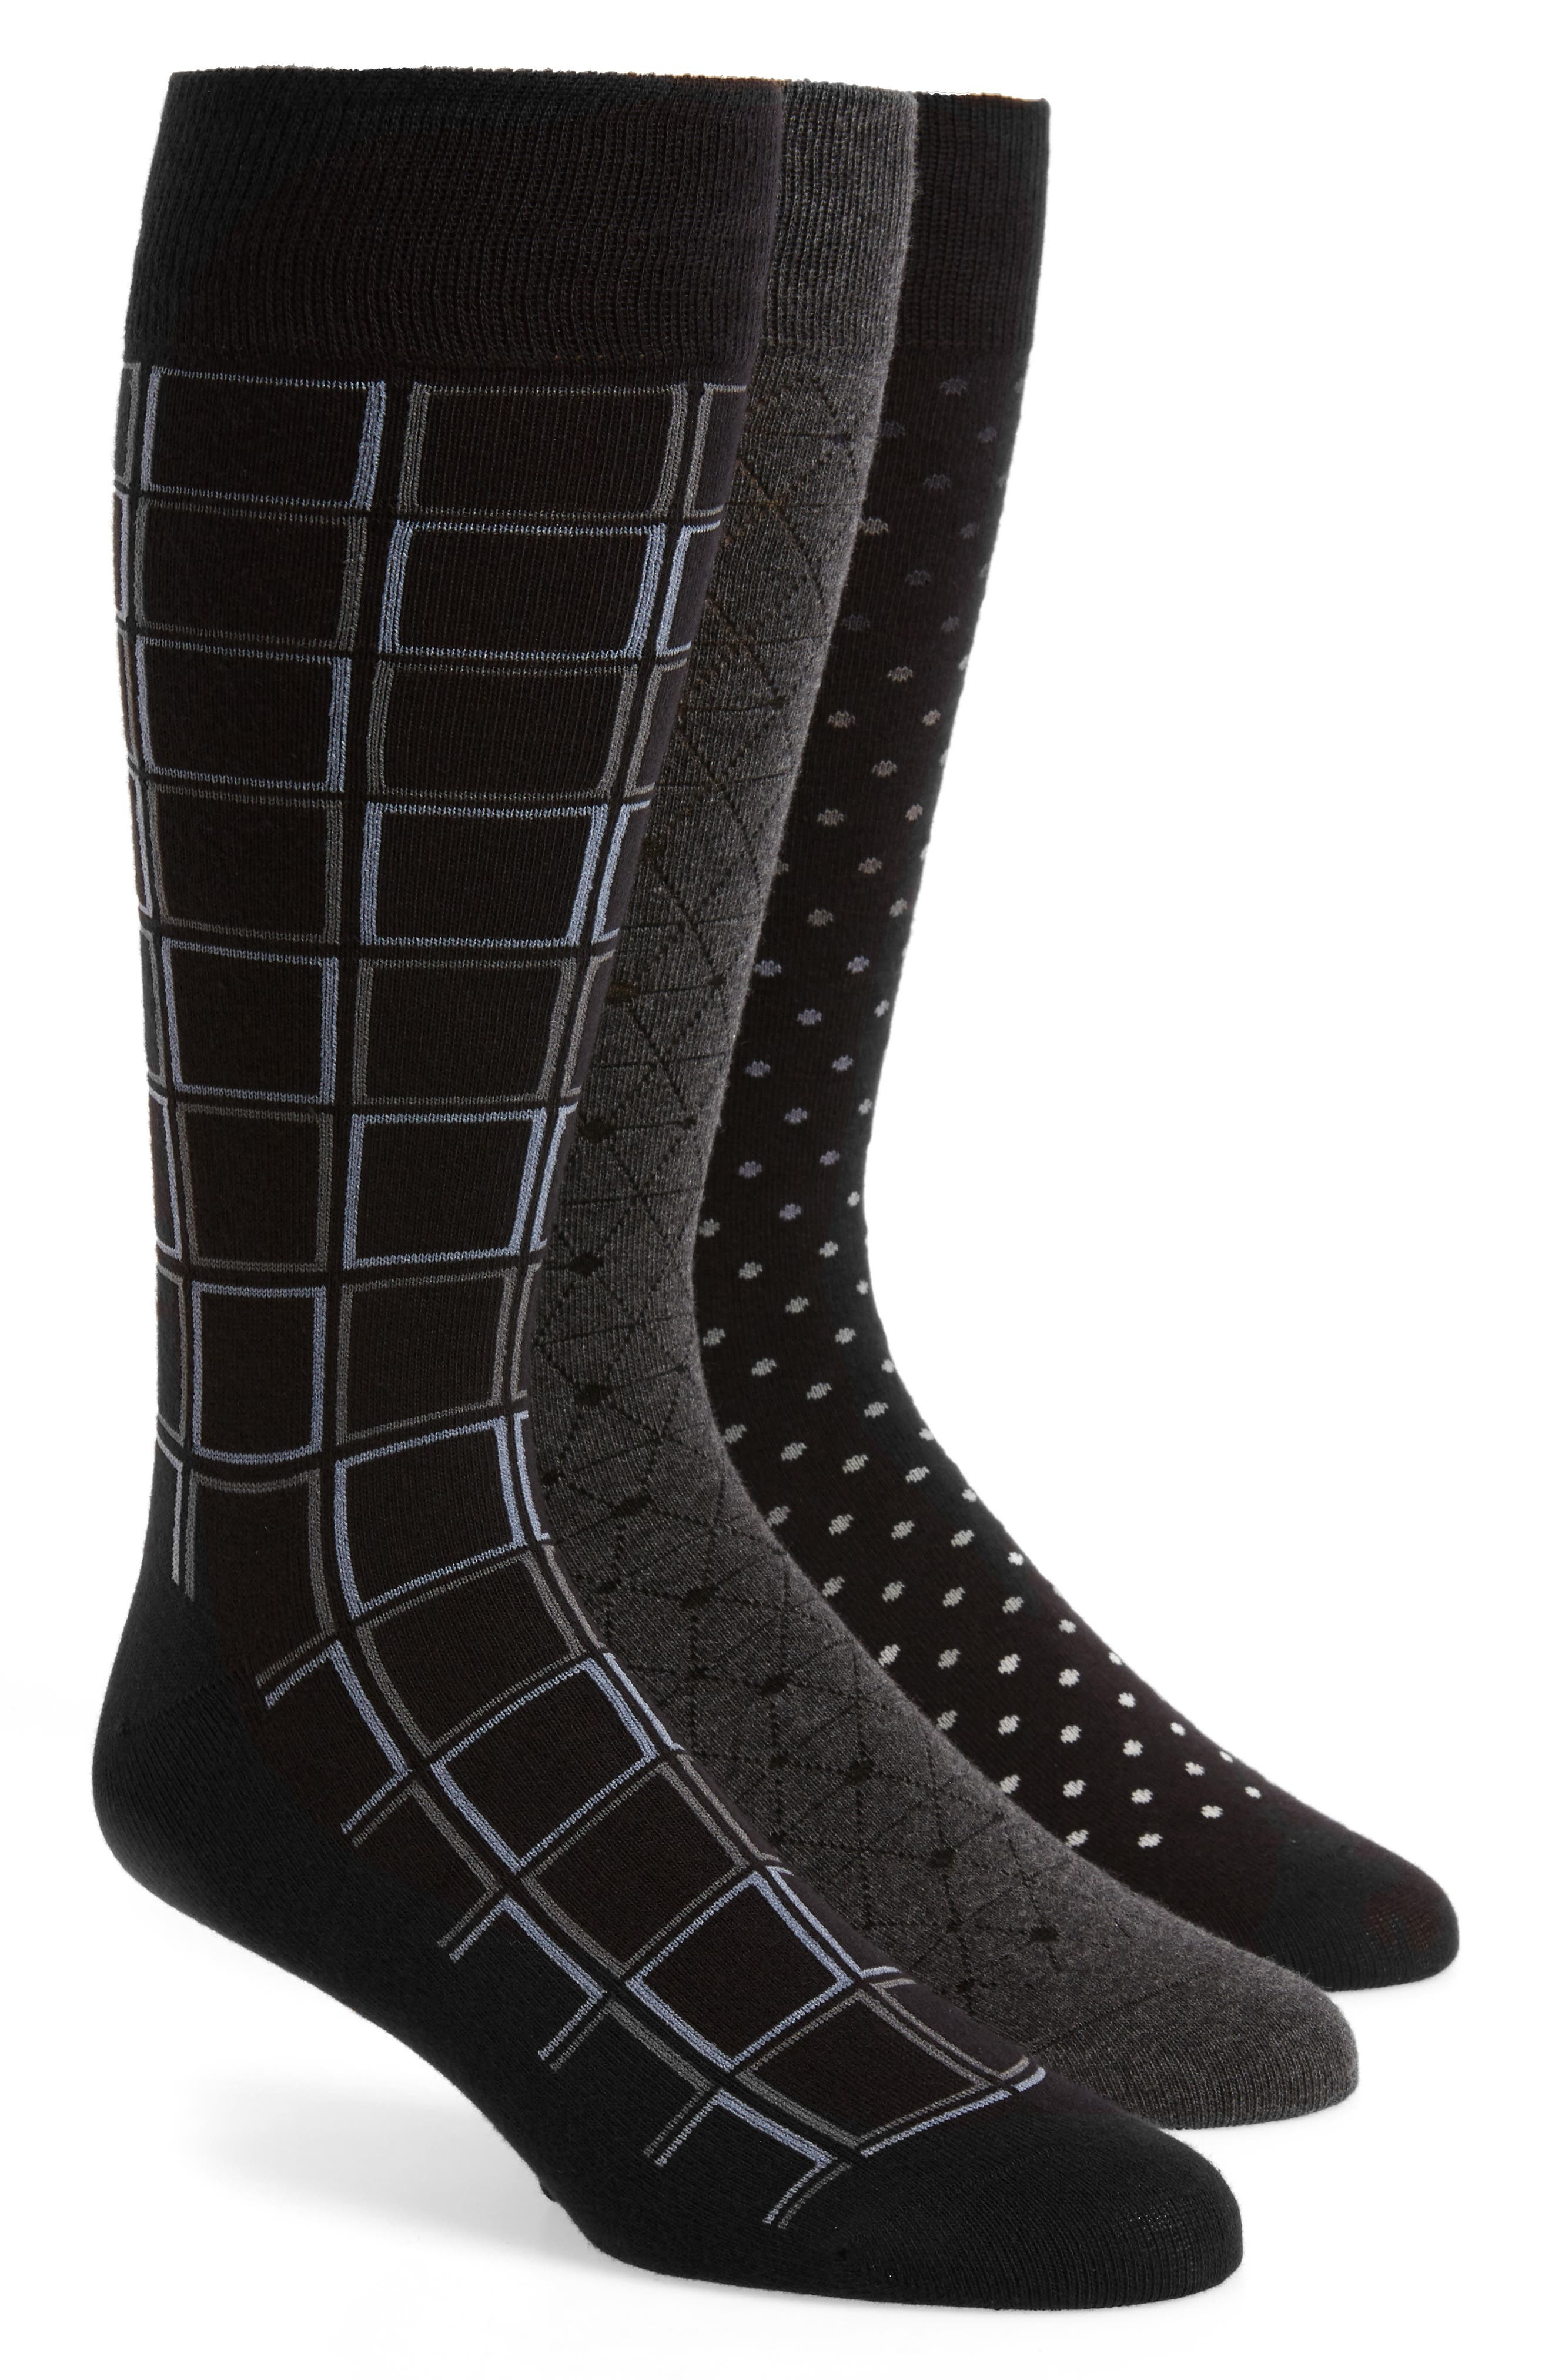 3-Pack Mixed Pattern Socks,                         Main,                         color, Black/ Charcoal